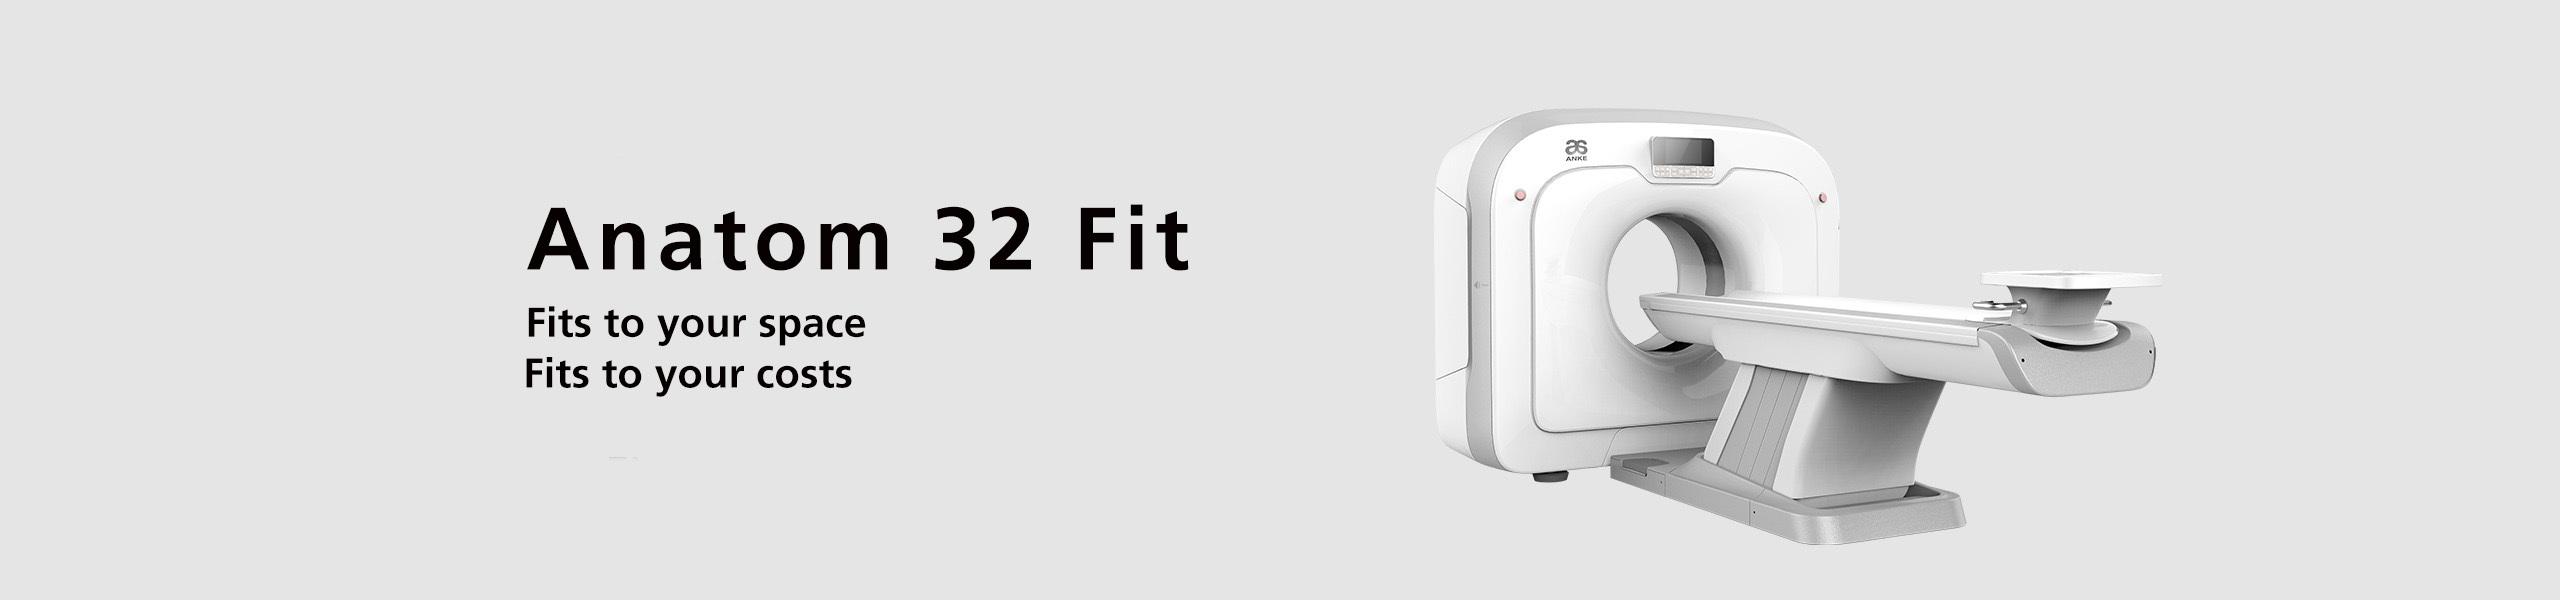 Anatom 32 Fit